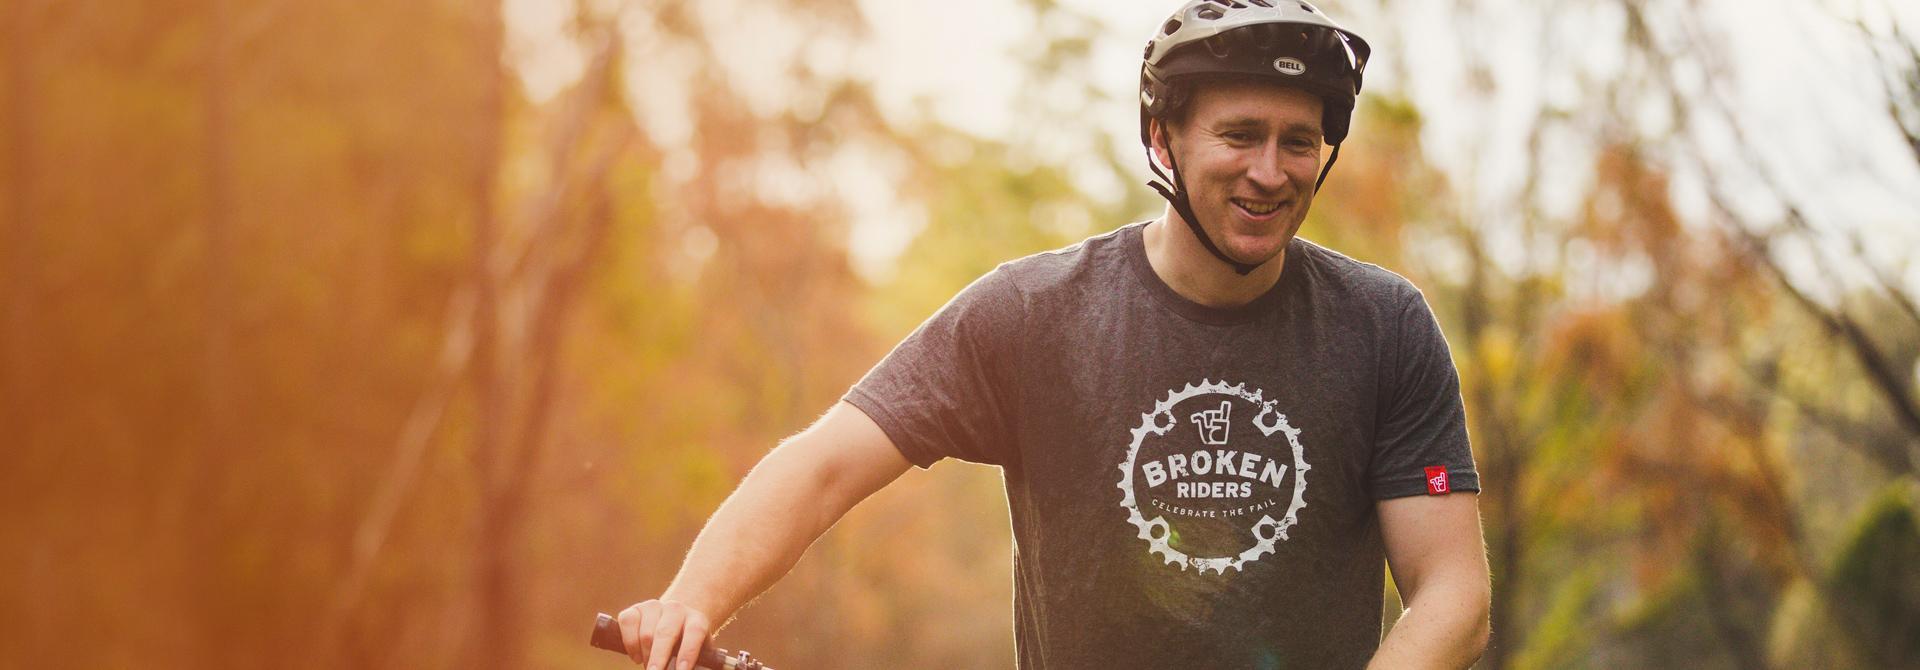 Broken Riders mountain bike apparel